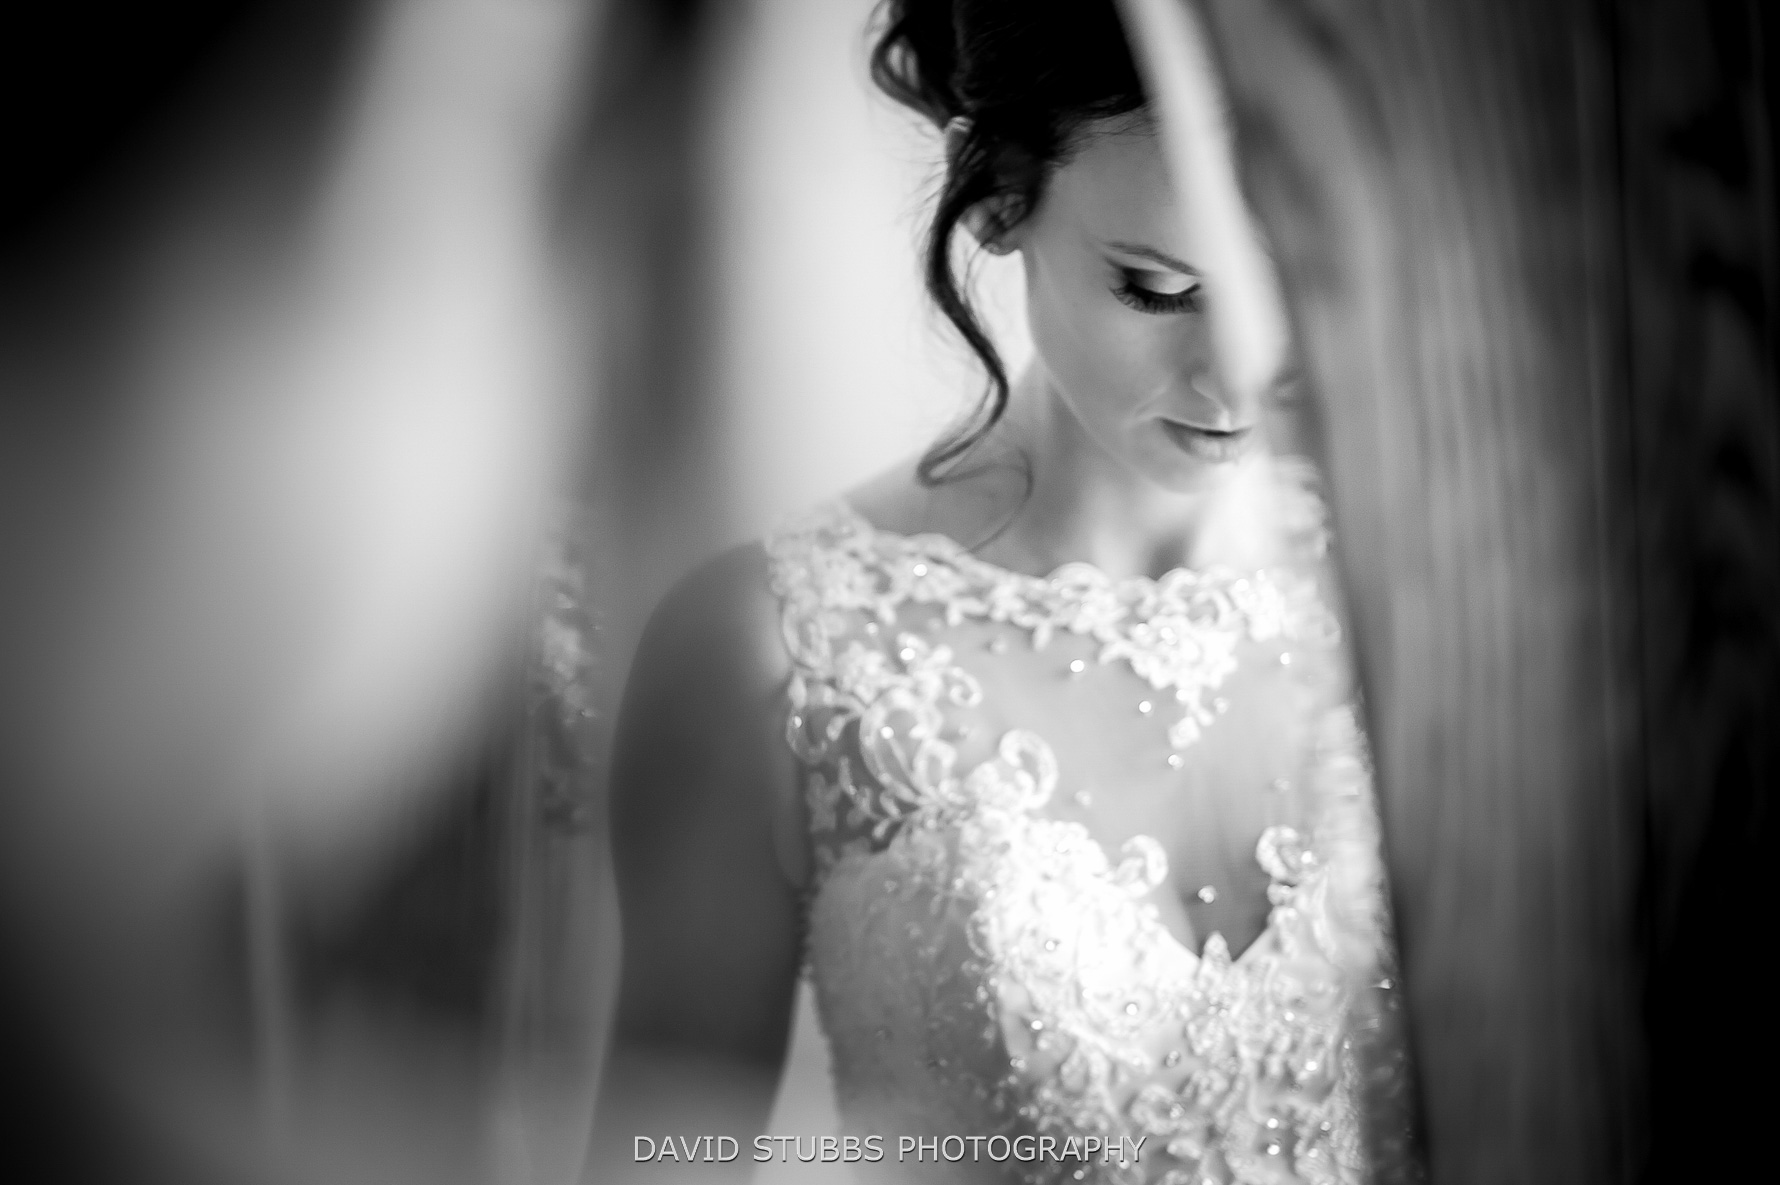 David-Stubbs-Photography-6